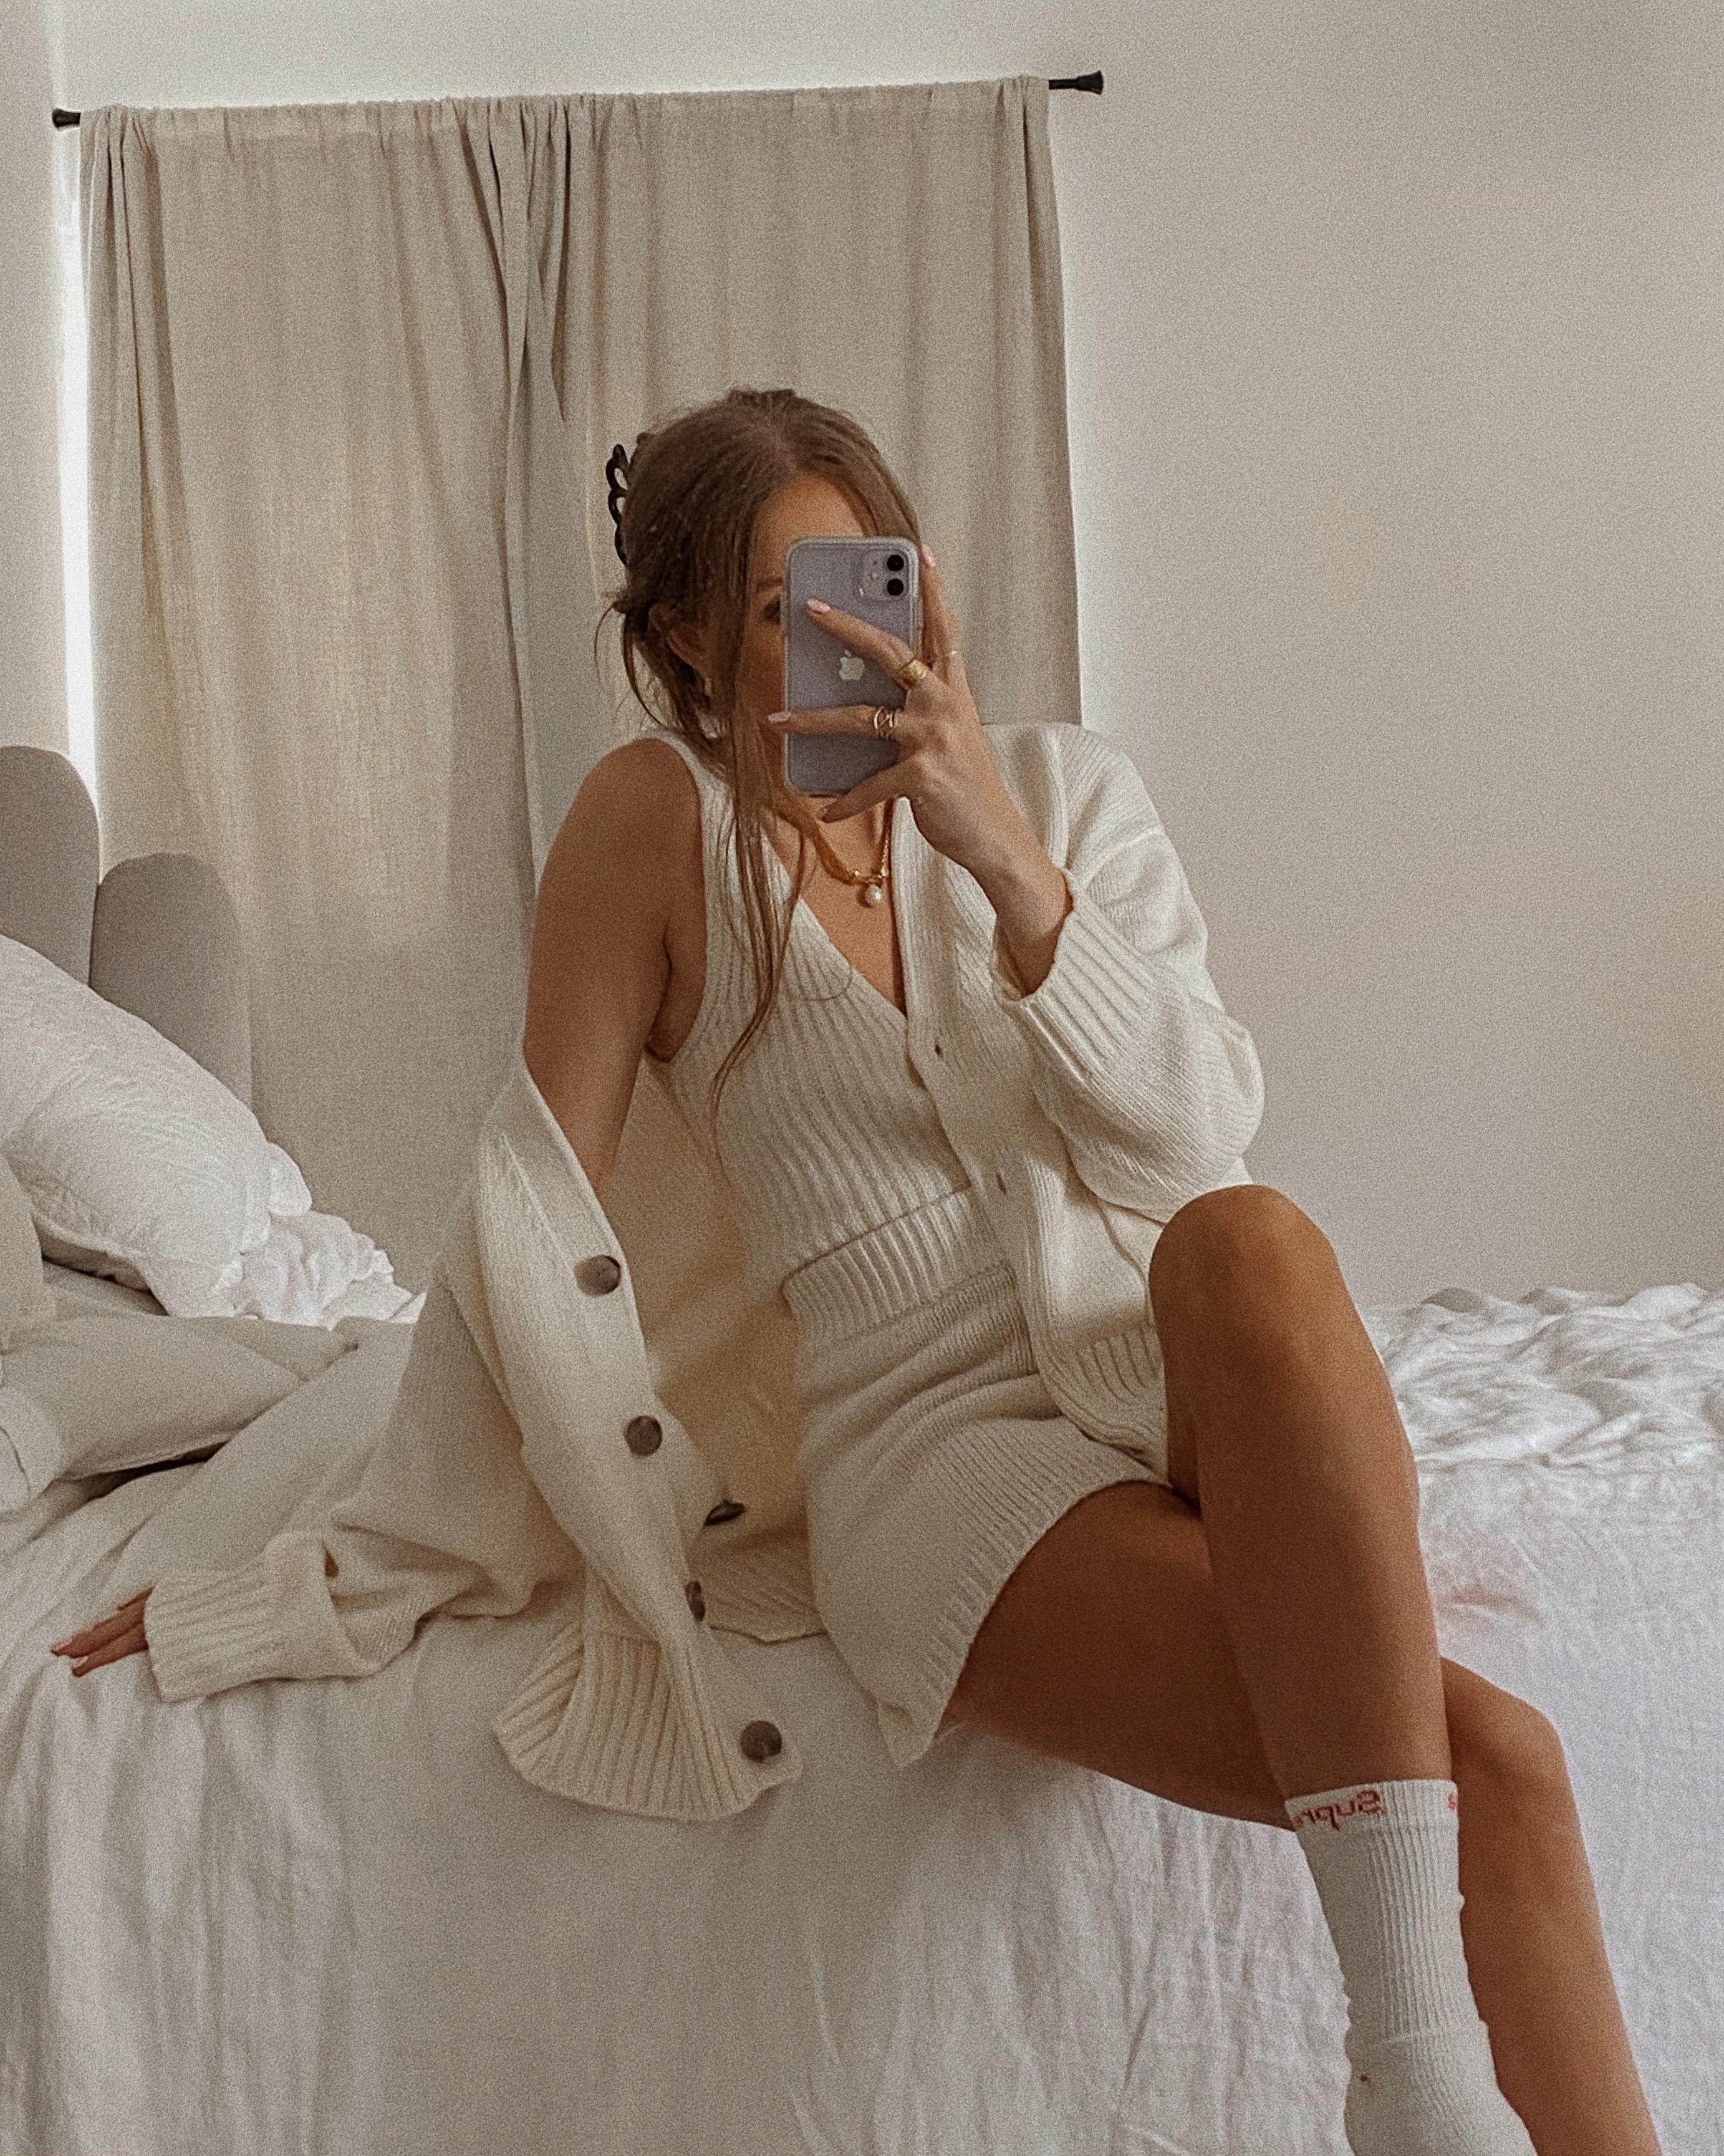 Winter Loungerwear - Amazon Fashion